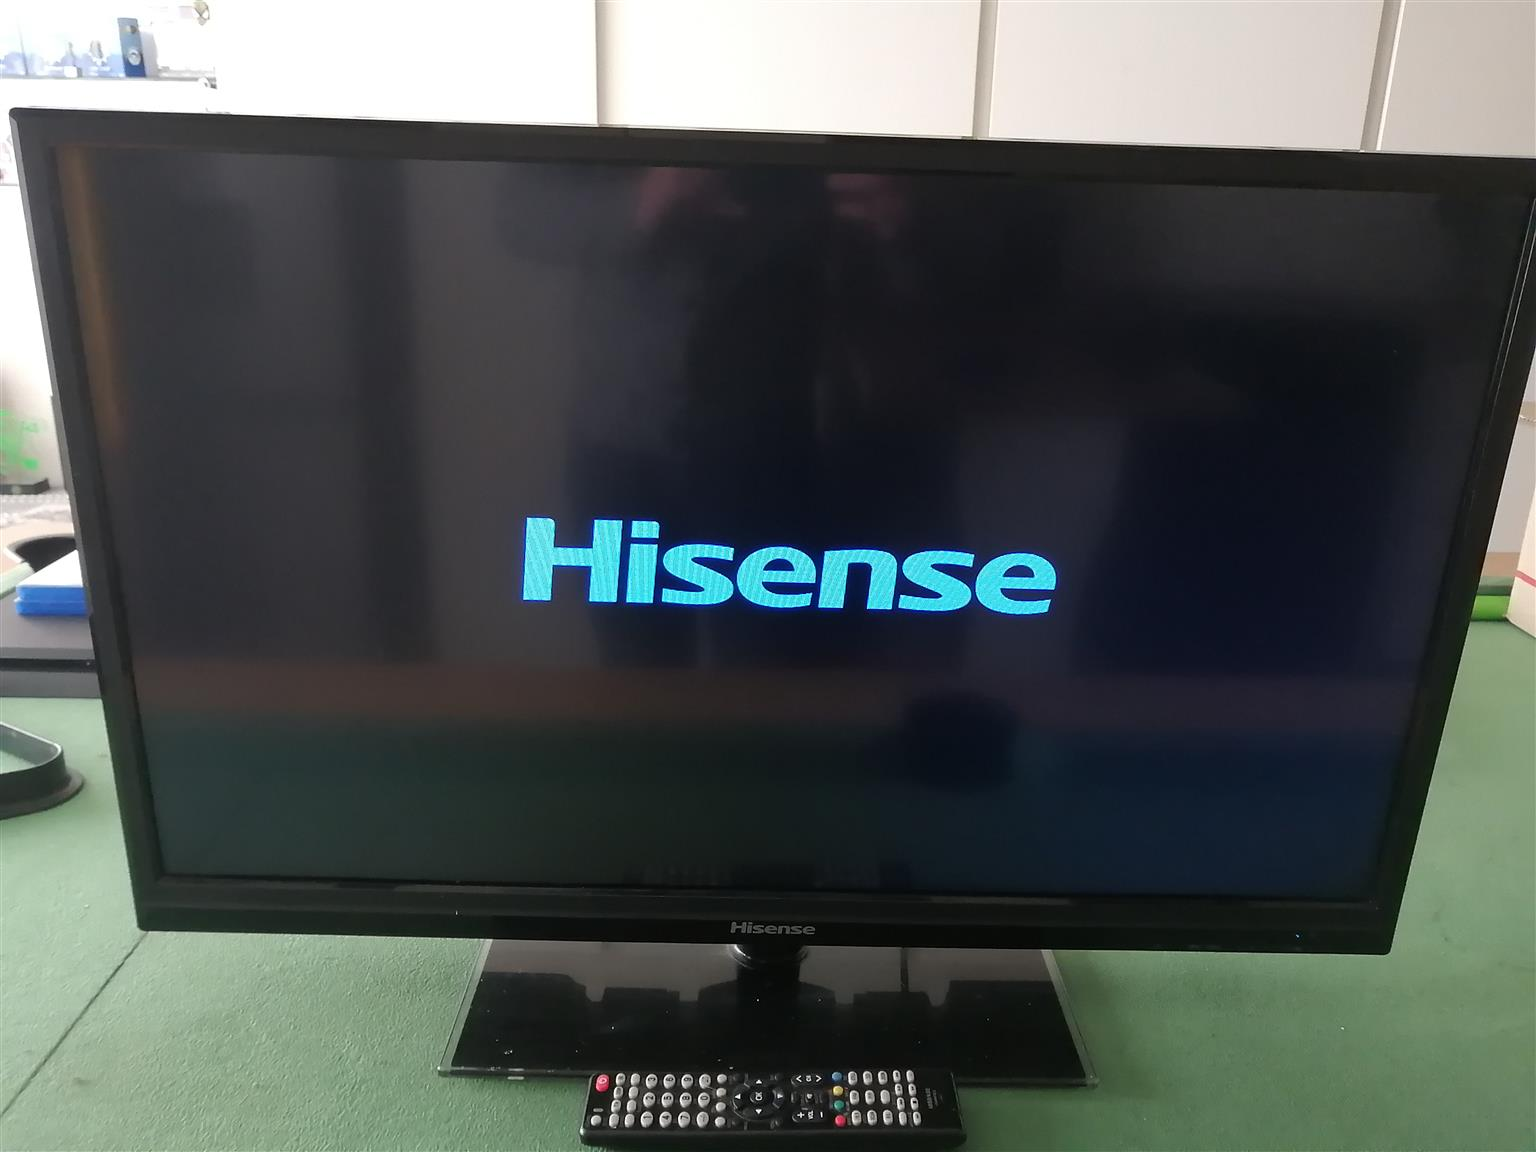 Hisense 32 led hd tv with remote